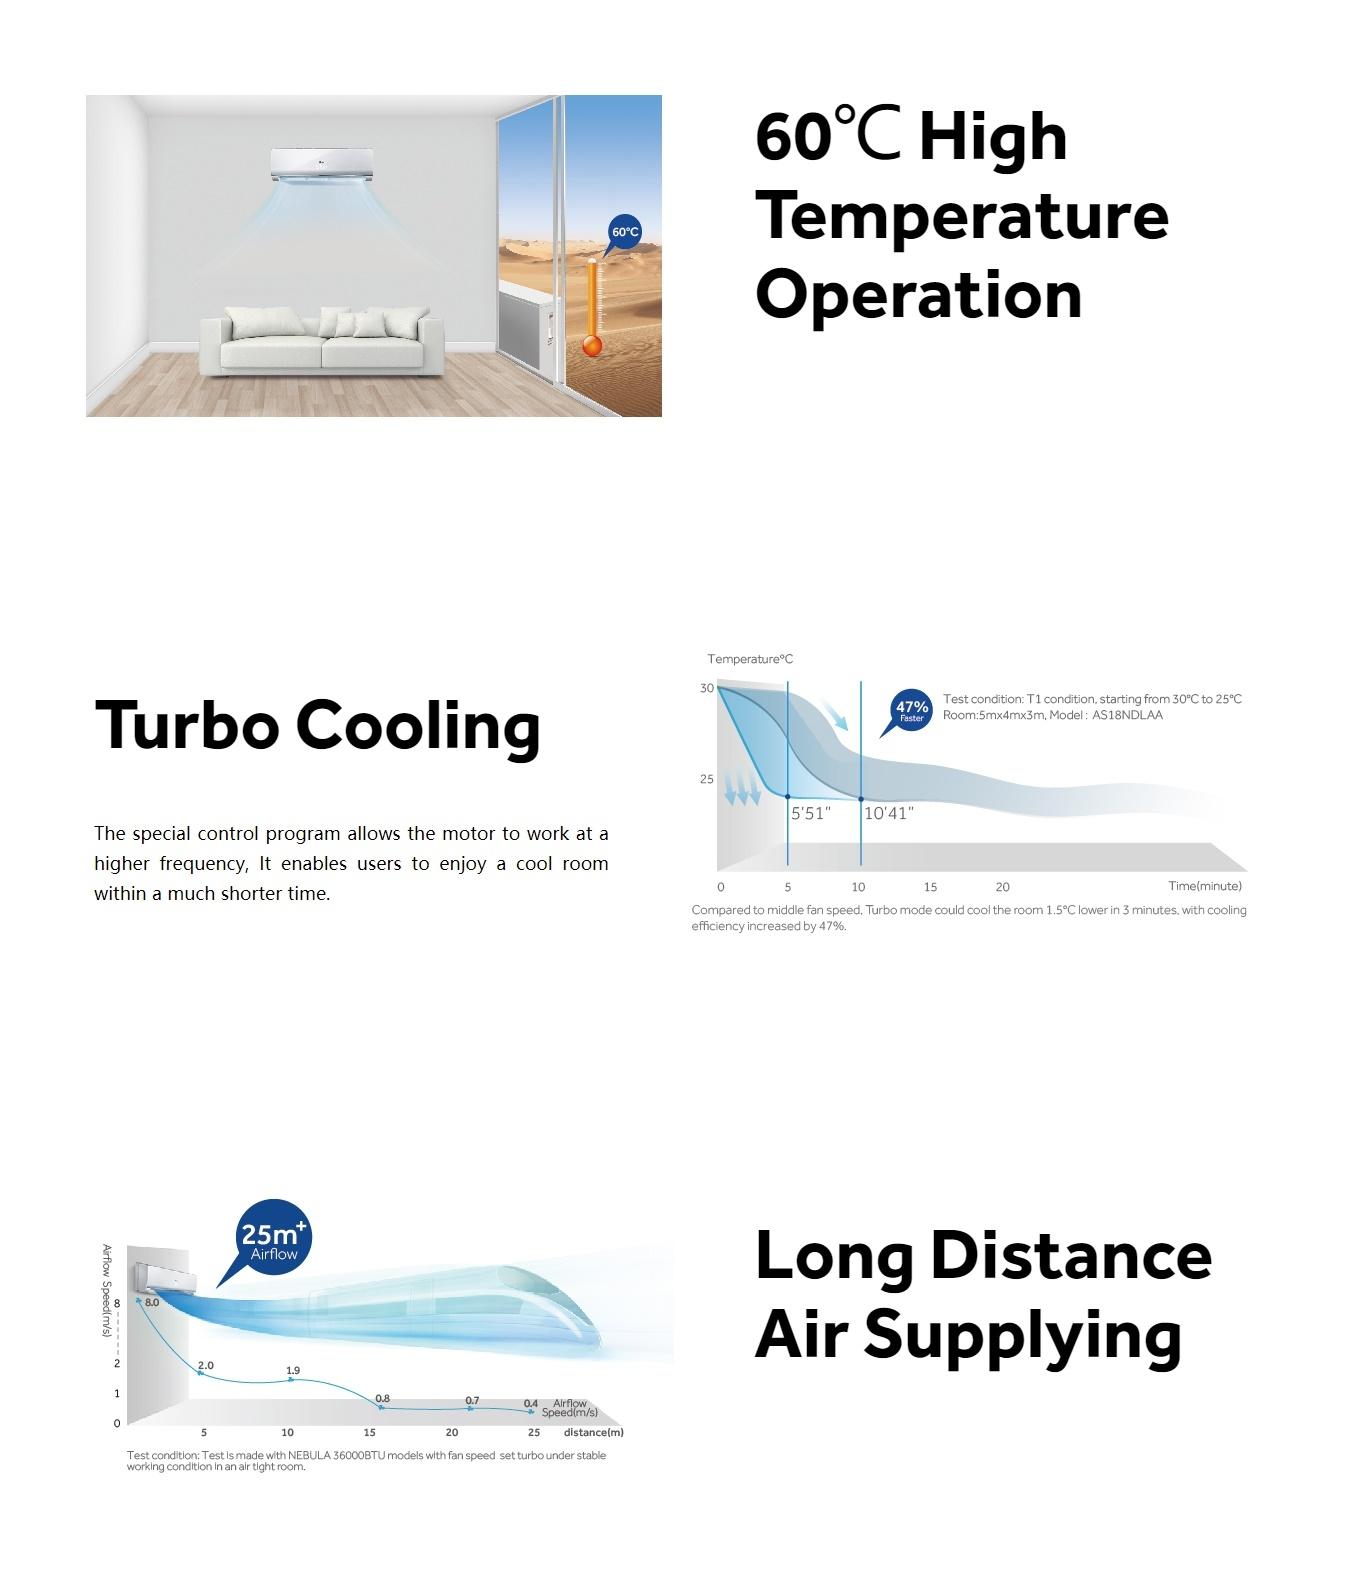 Haier AC Spt 12,600 Cool only (HSU-12LNA13/R2(T3))